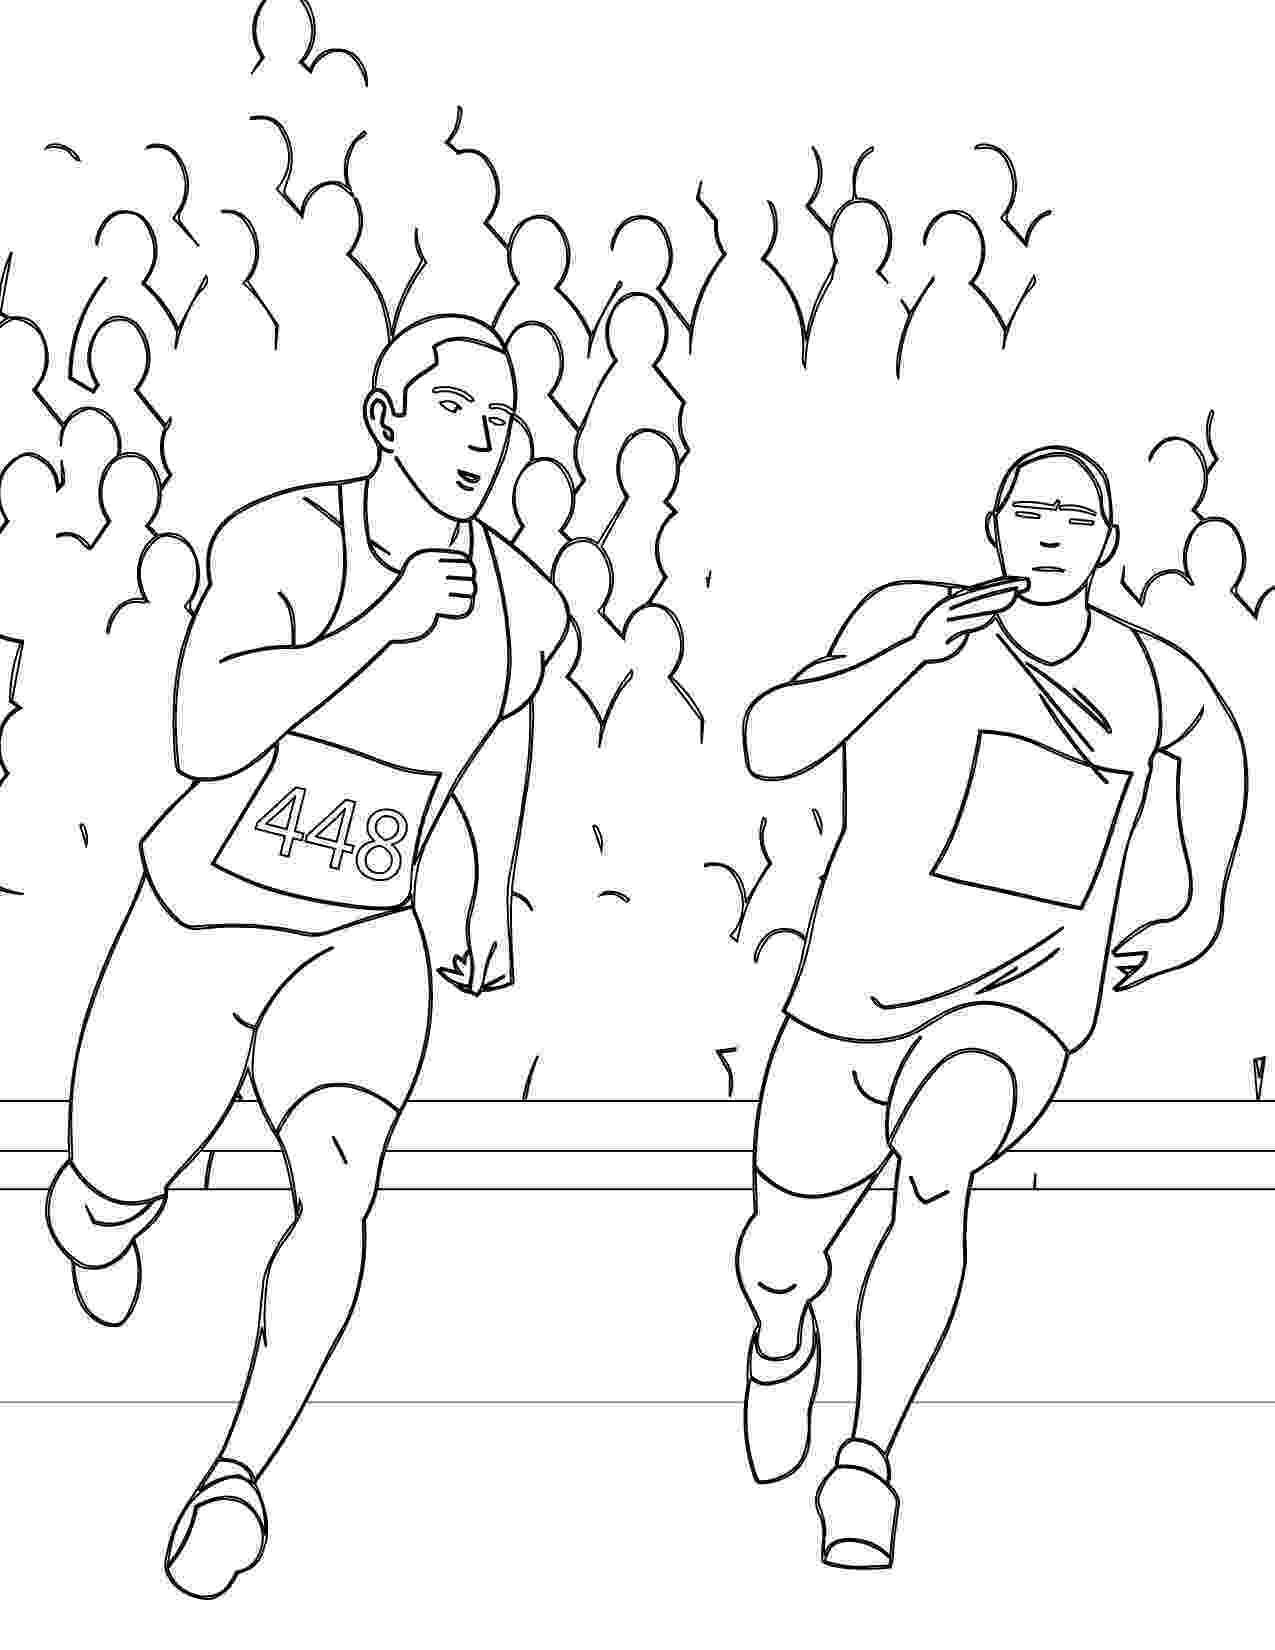 running coloring pages running coloring pages getcoloringpagescom coloring pages running